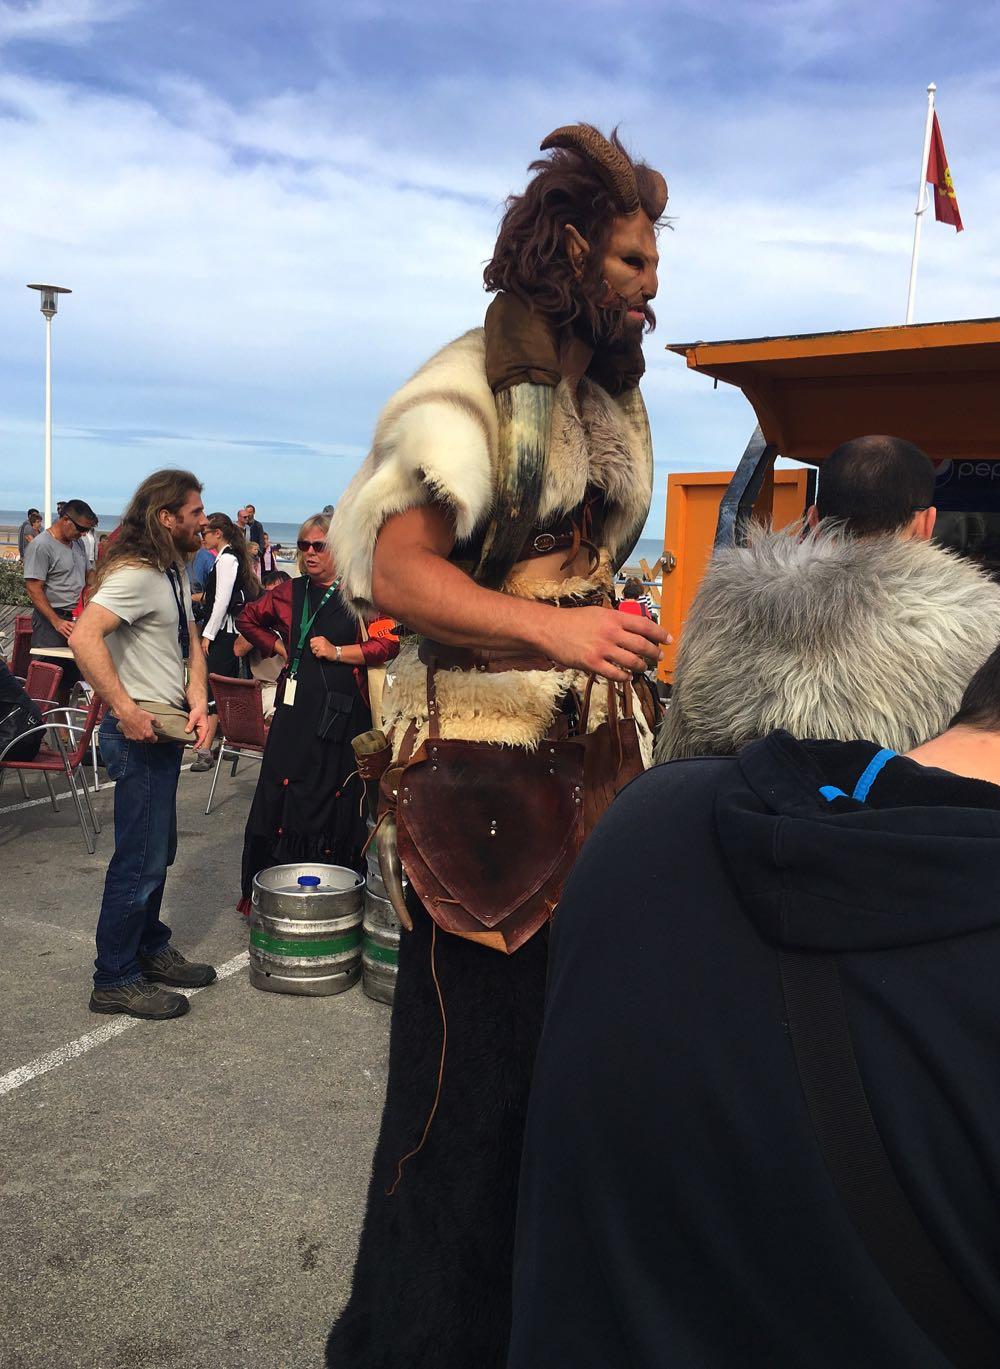 Cider&Dragon-Festival-Merville-FrancevilleCider&Dragon-Festival12